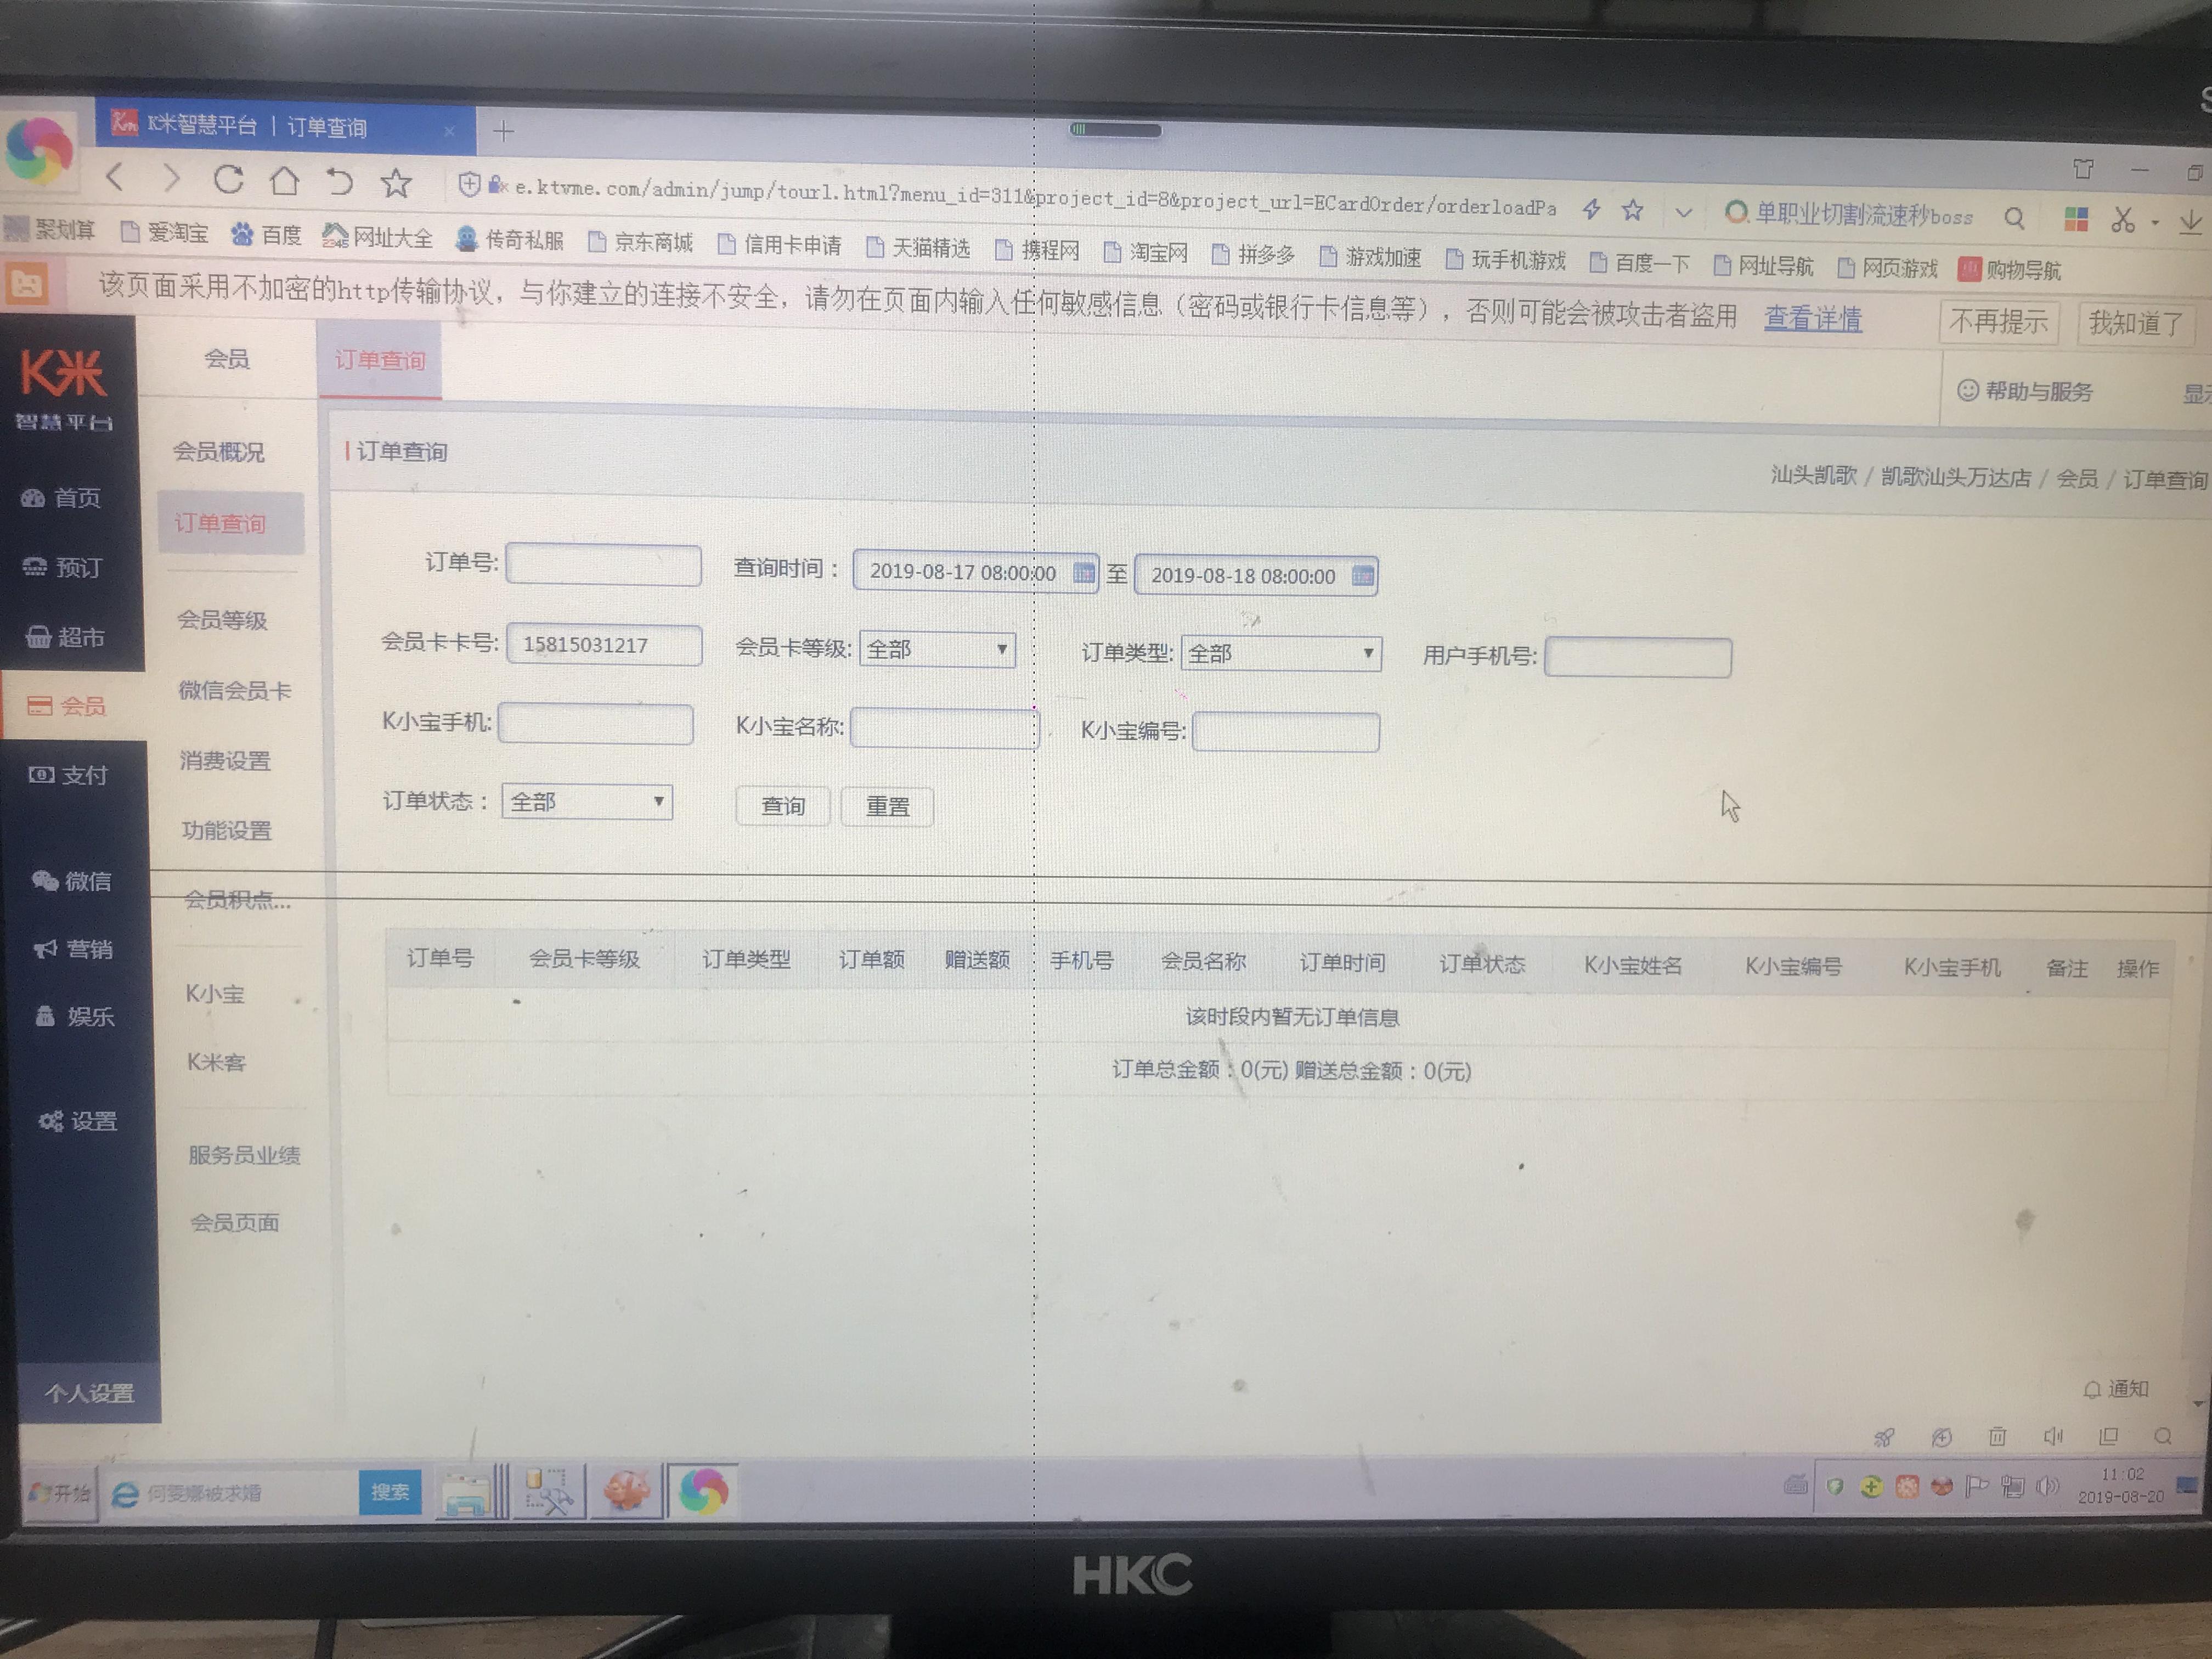 283863DC-AAAD-45A7-A4C0-A8591FFB94E1.jpeg